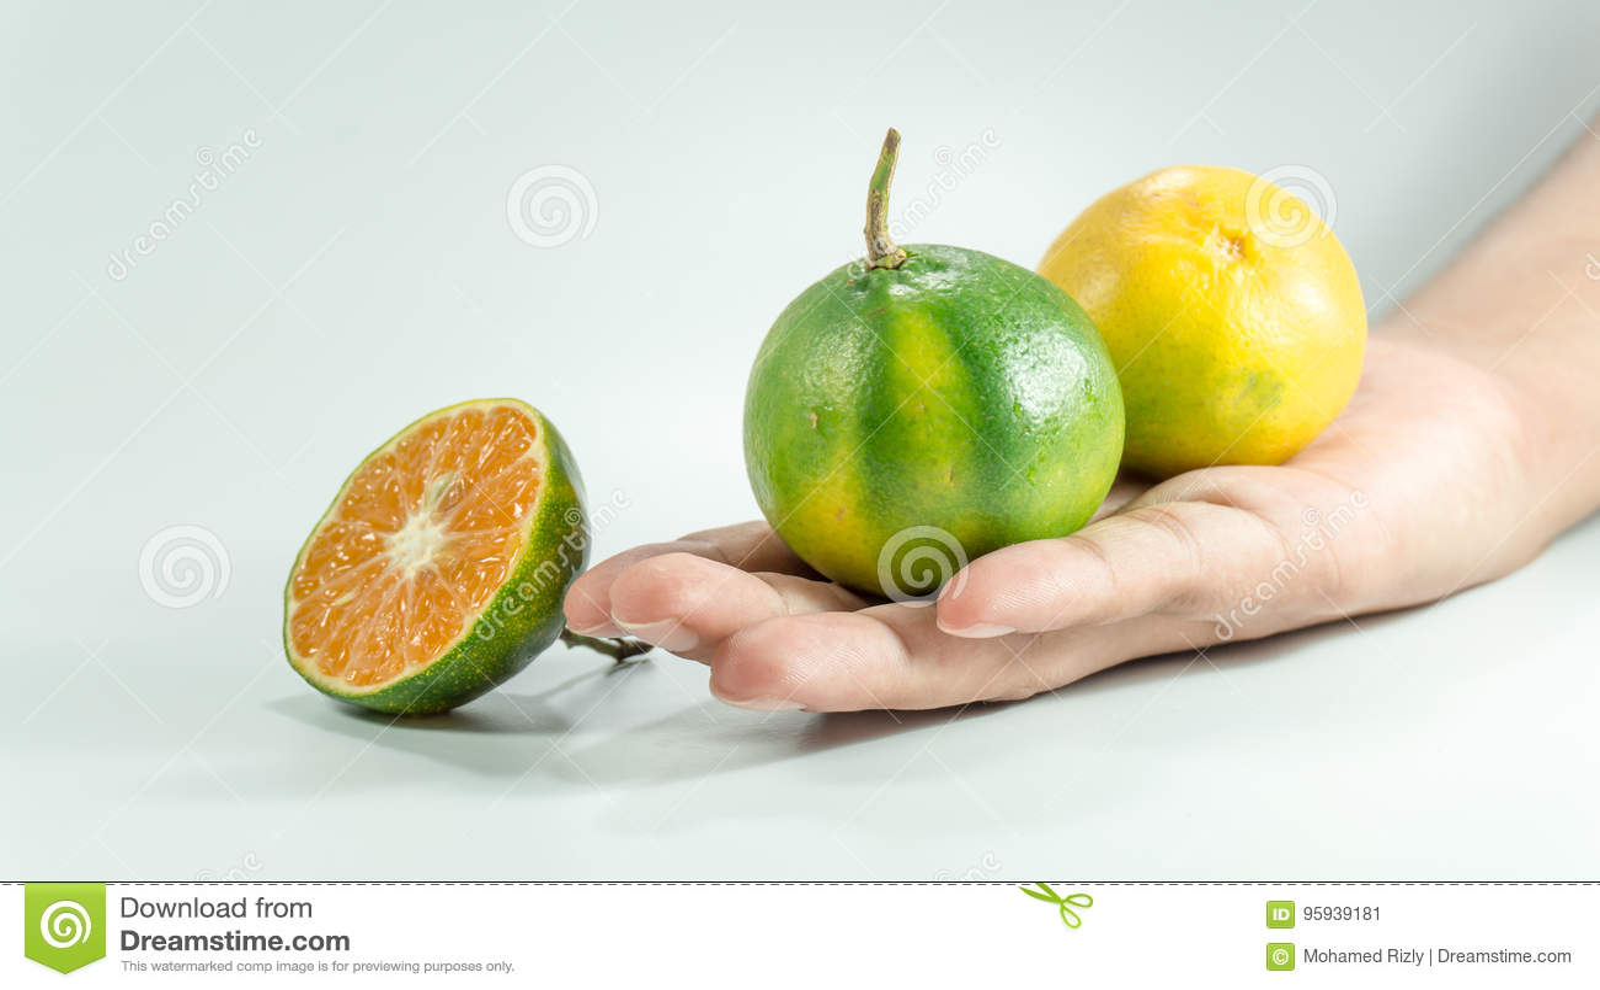 Sliced cube of fresh tangerine and one tangerine on hand.